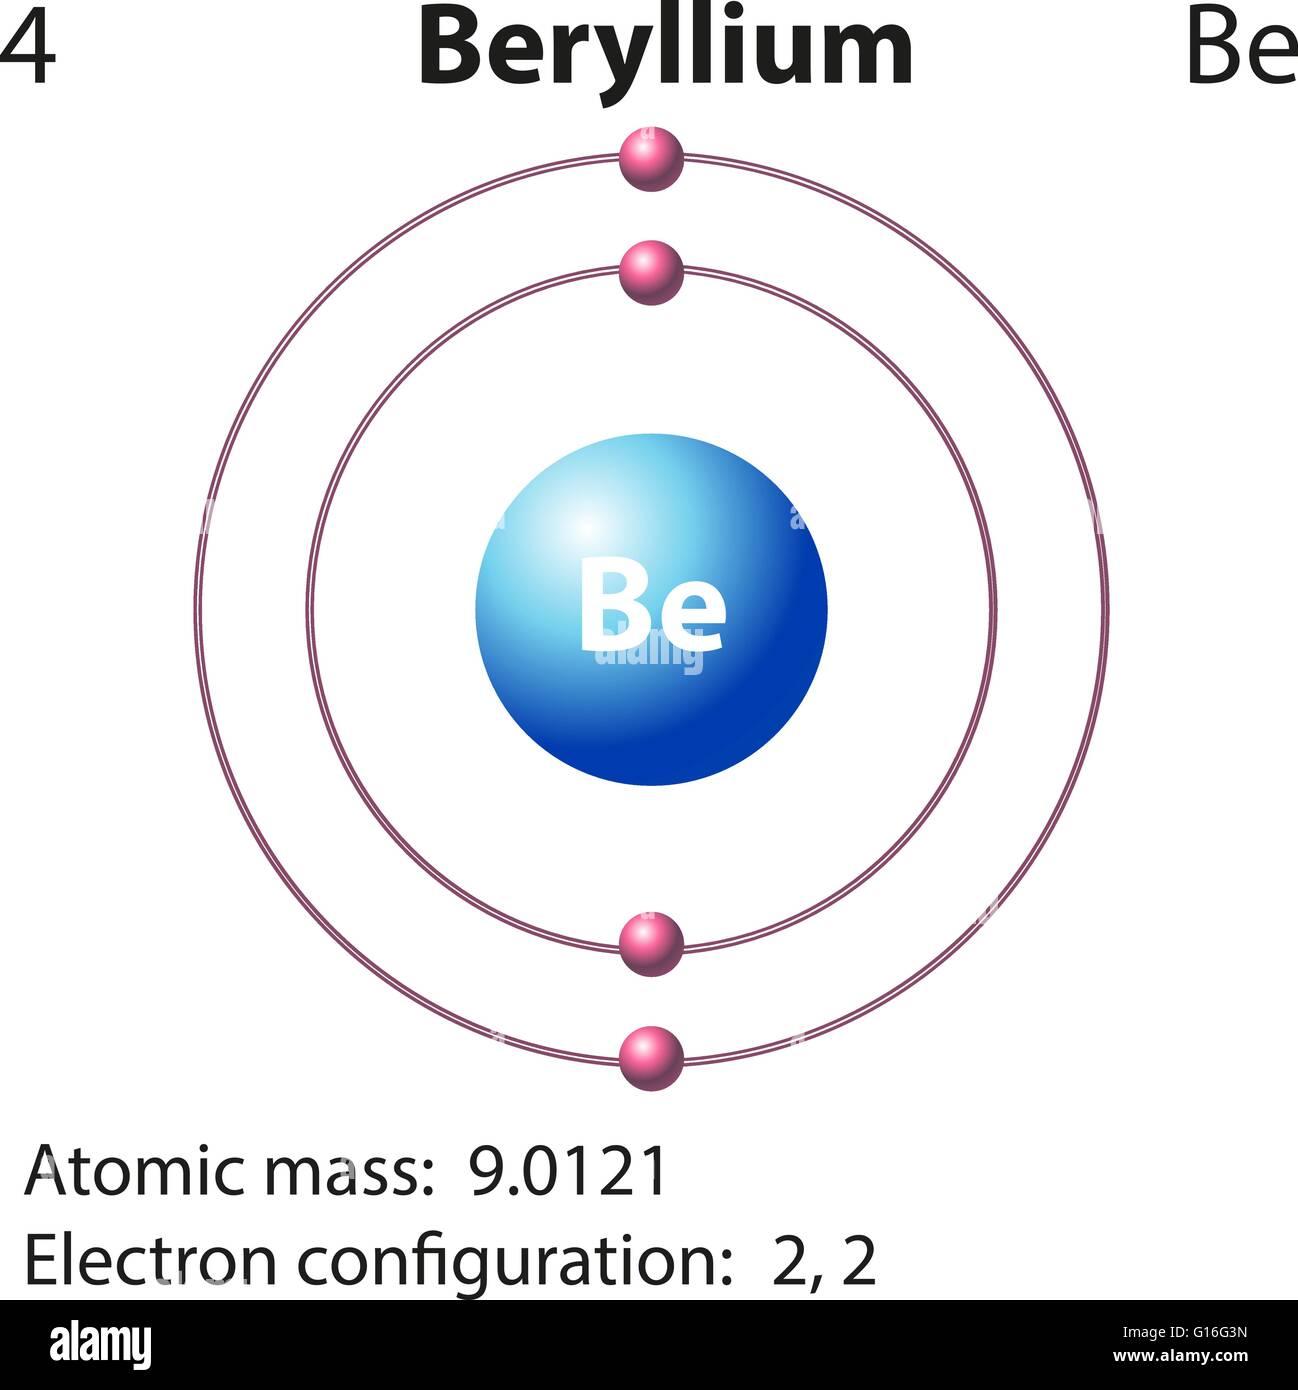 Diagram representation of the element beryllium illustration stock diagram representation of the element beryllium illustration urtaz Image collections